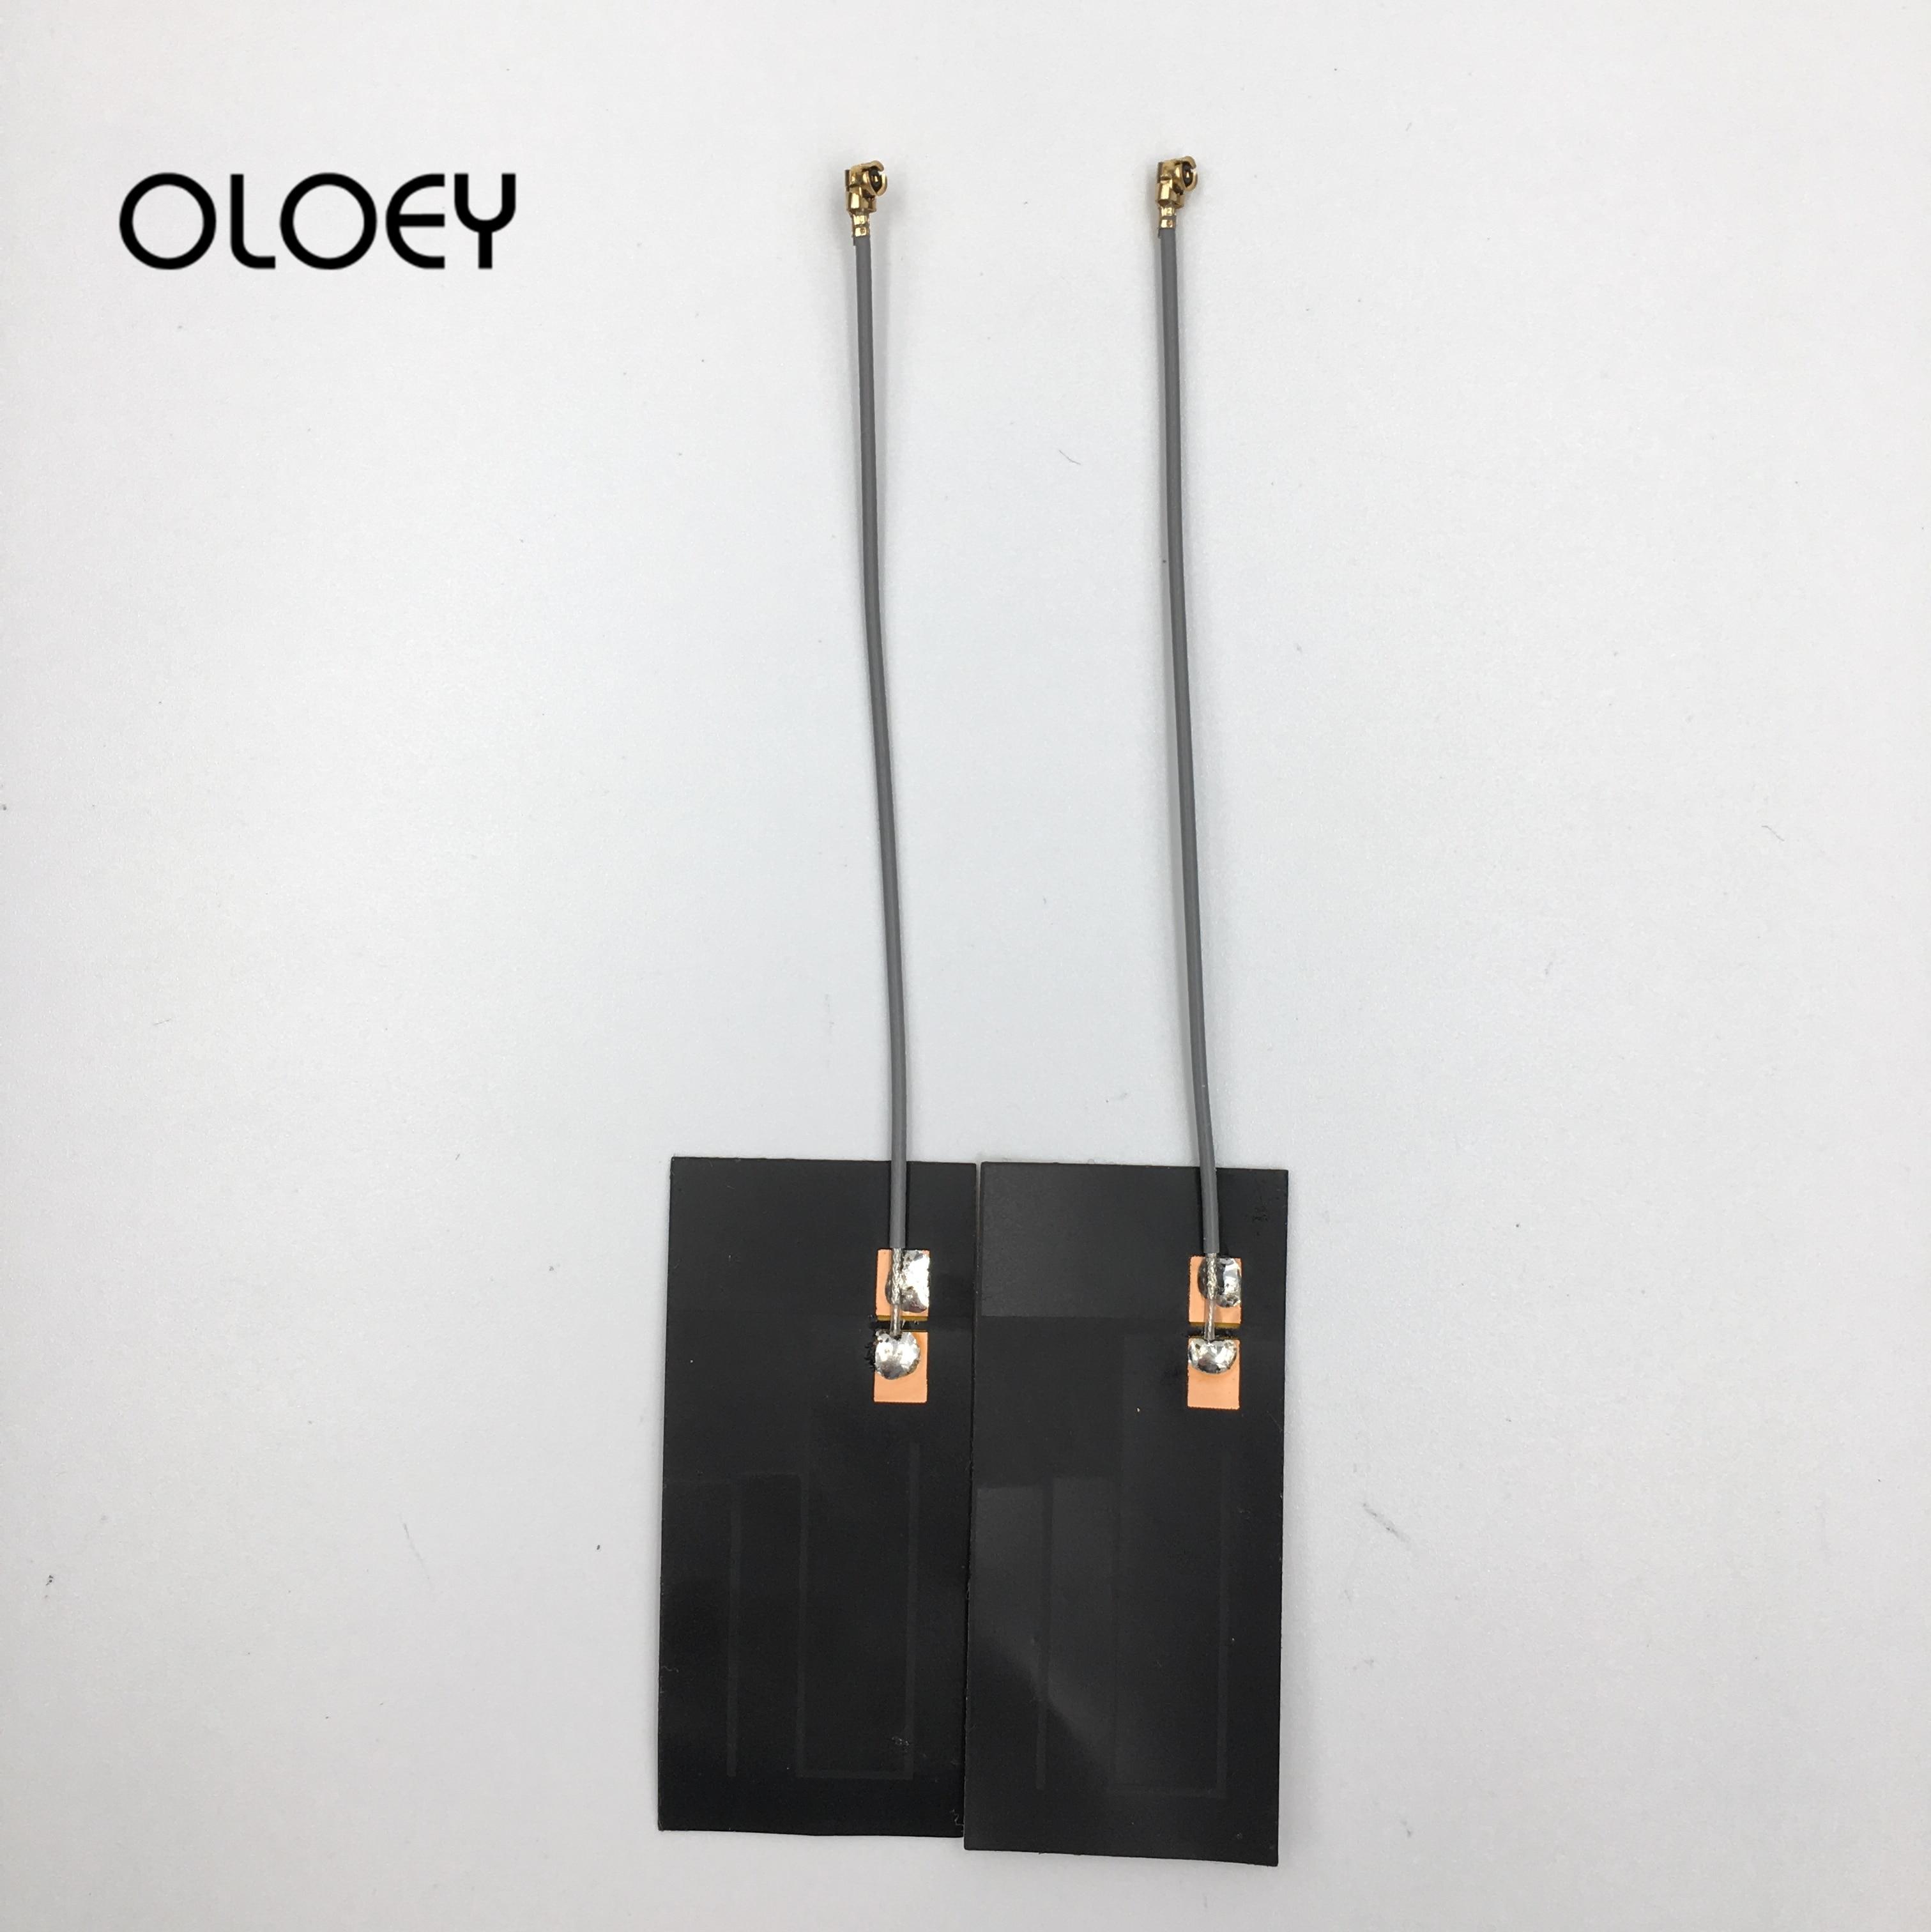 LT EAntenna, NBIOT Antenna, WCDMA Antenna,Flexible Antenna FPC Antenna, Built-in Antenna, Black Type, Cable Length: 10cm